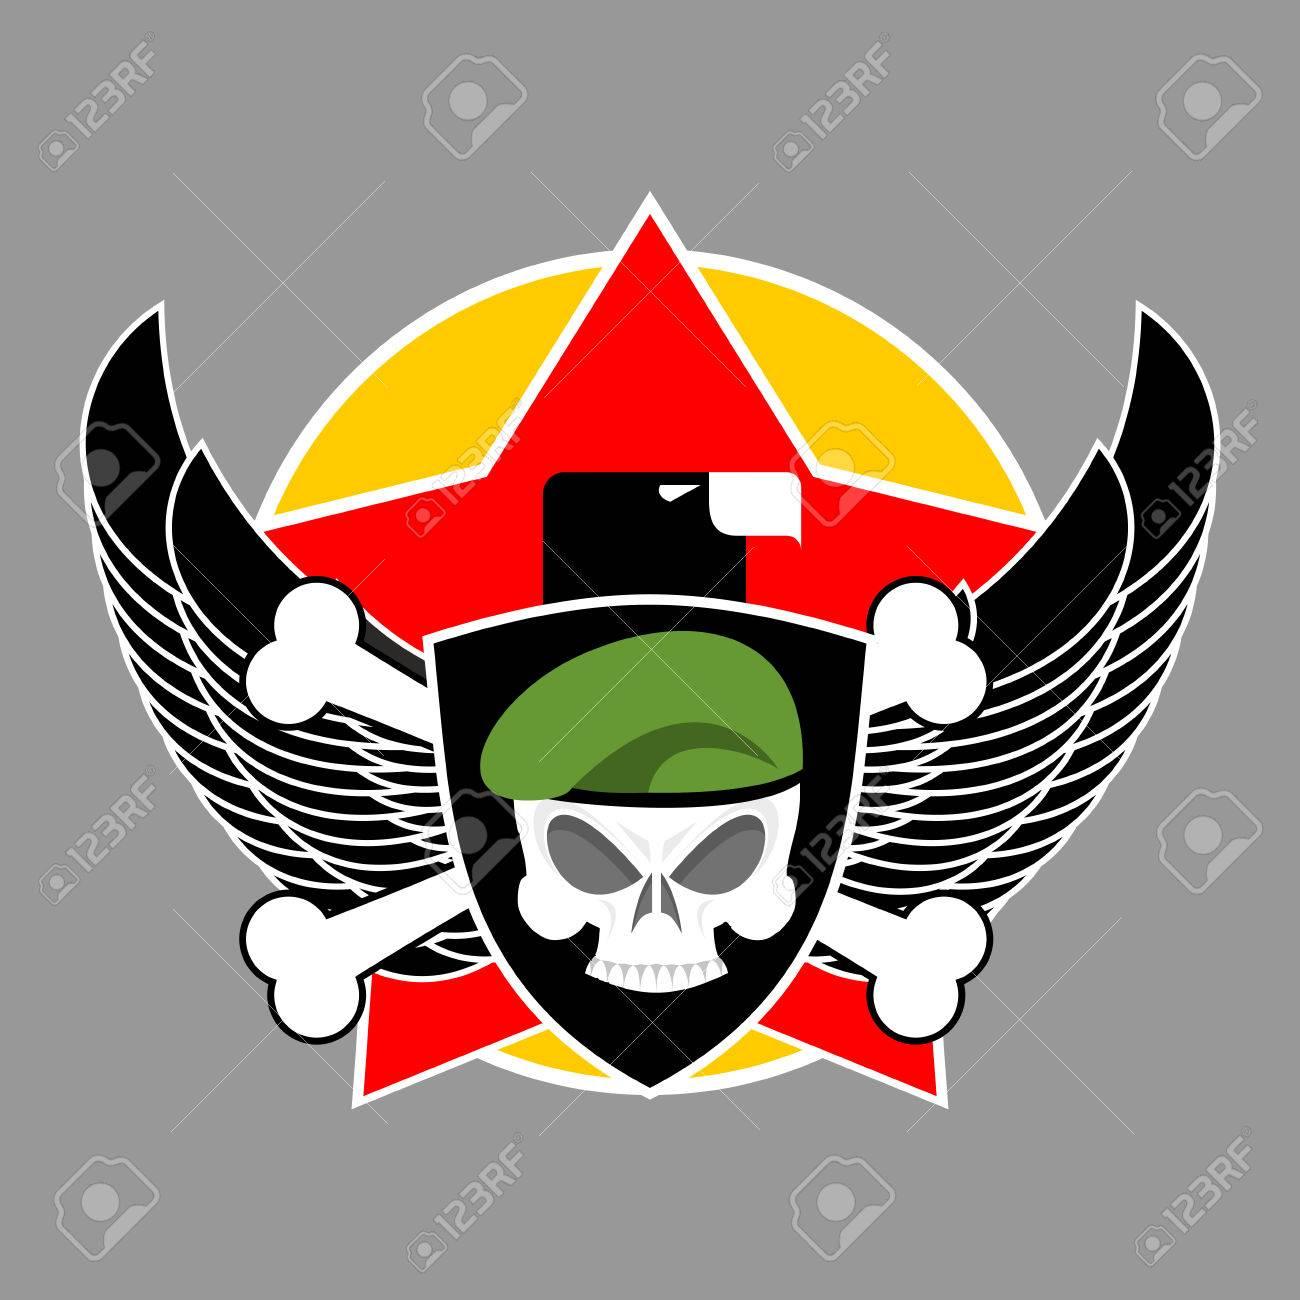 military emblem army soldiers badge skull in beret wings rh 123rf com Bird Wings Vector Aviation Wings Vector